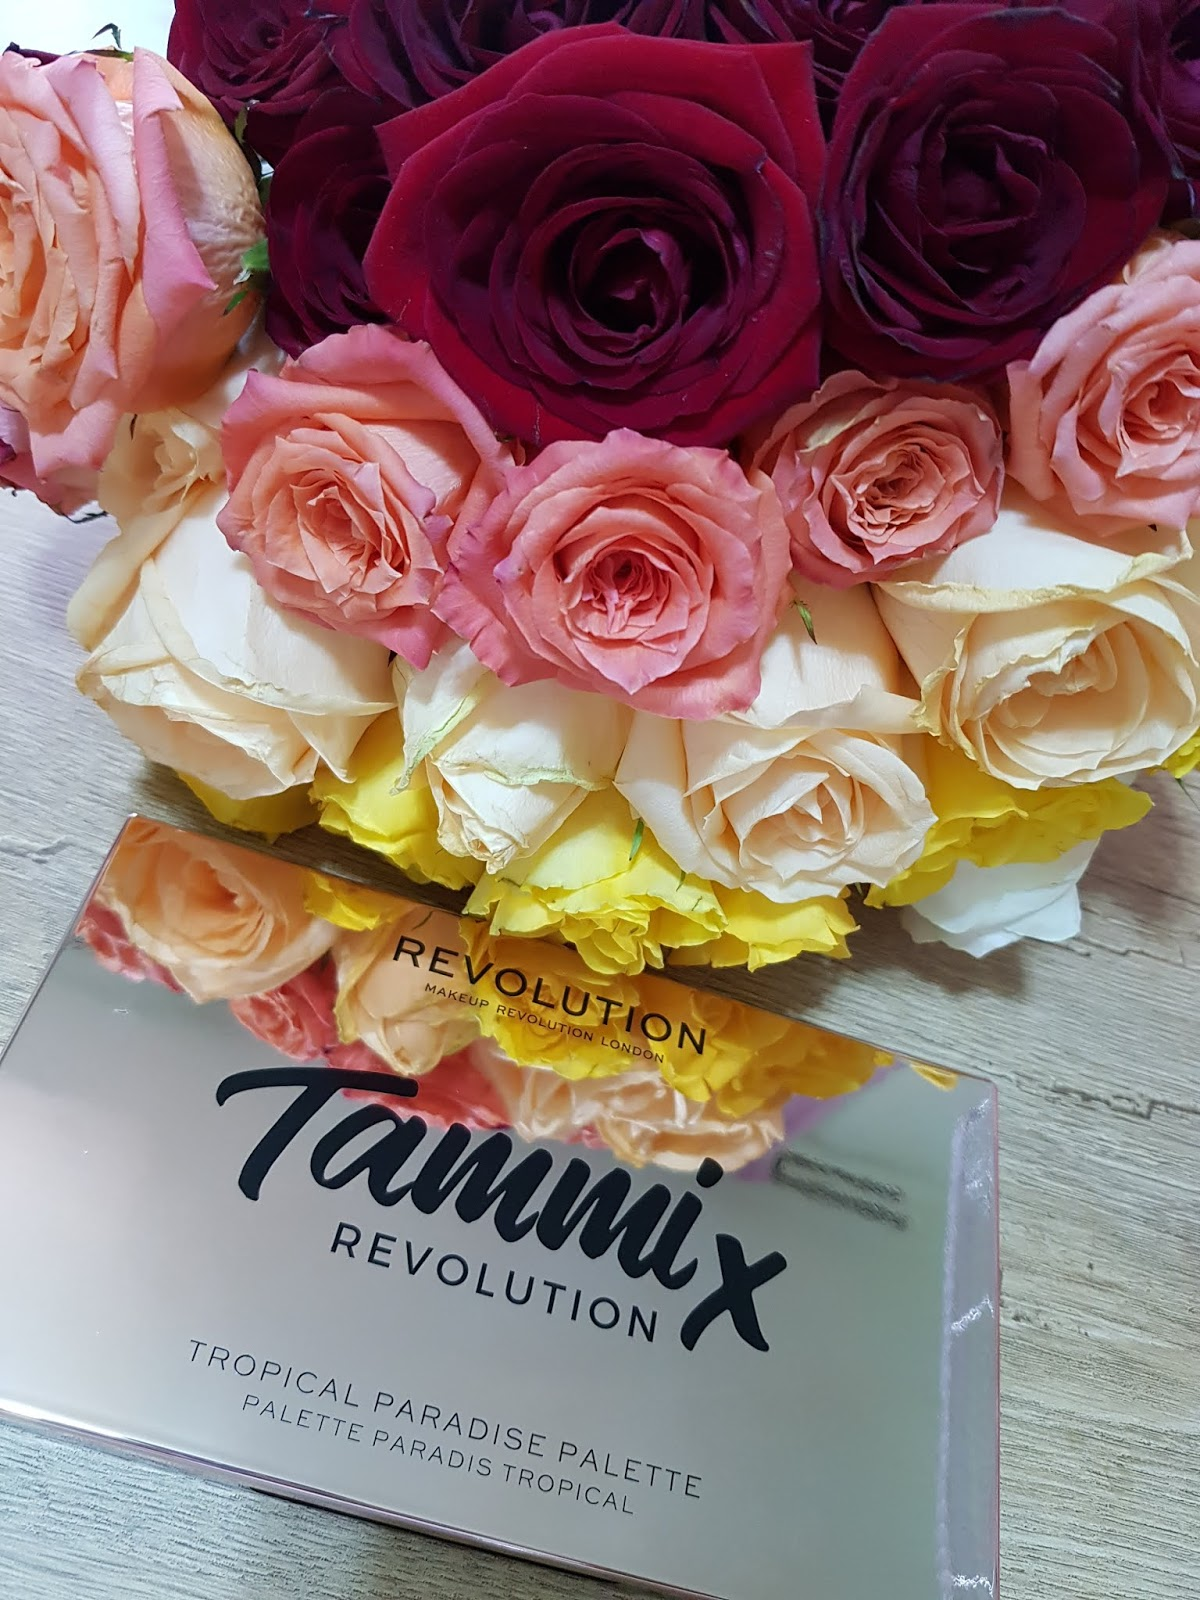 Tammi-Revolution-1-Notino.ro